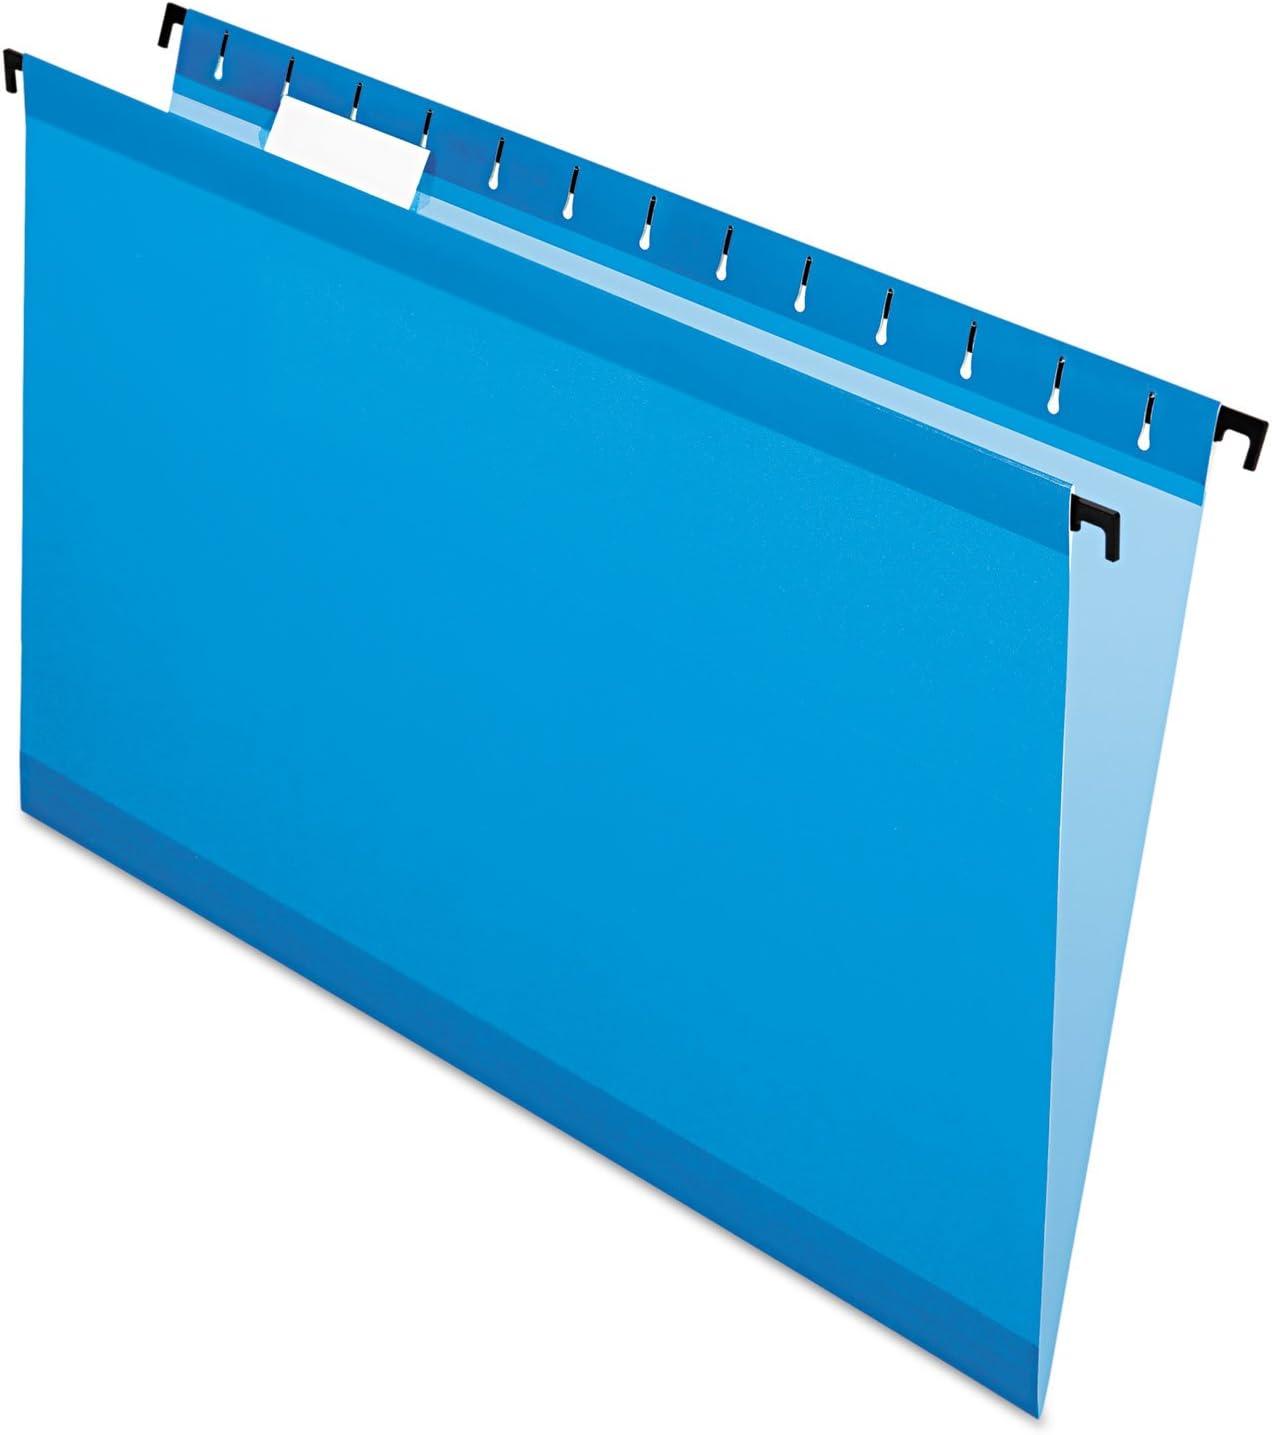 PFX615315BLU - Pendaflex SureHook Hanging Folders Many popular brands New Free Shipping Tech.